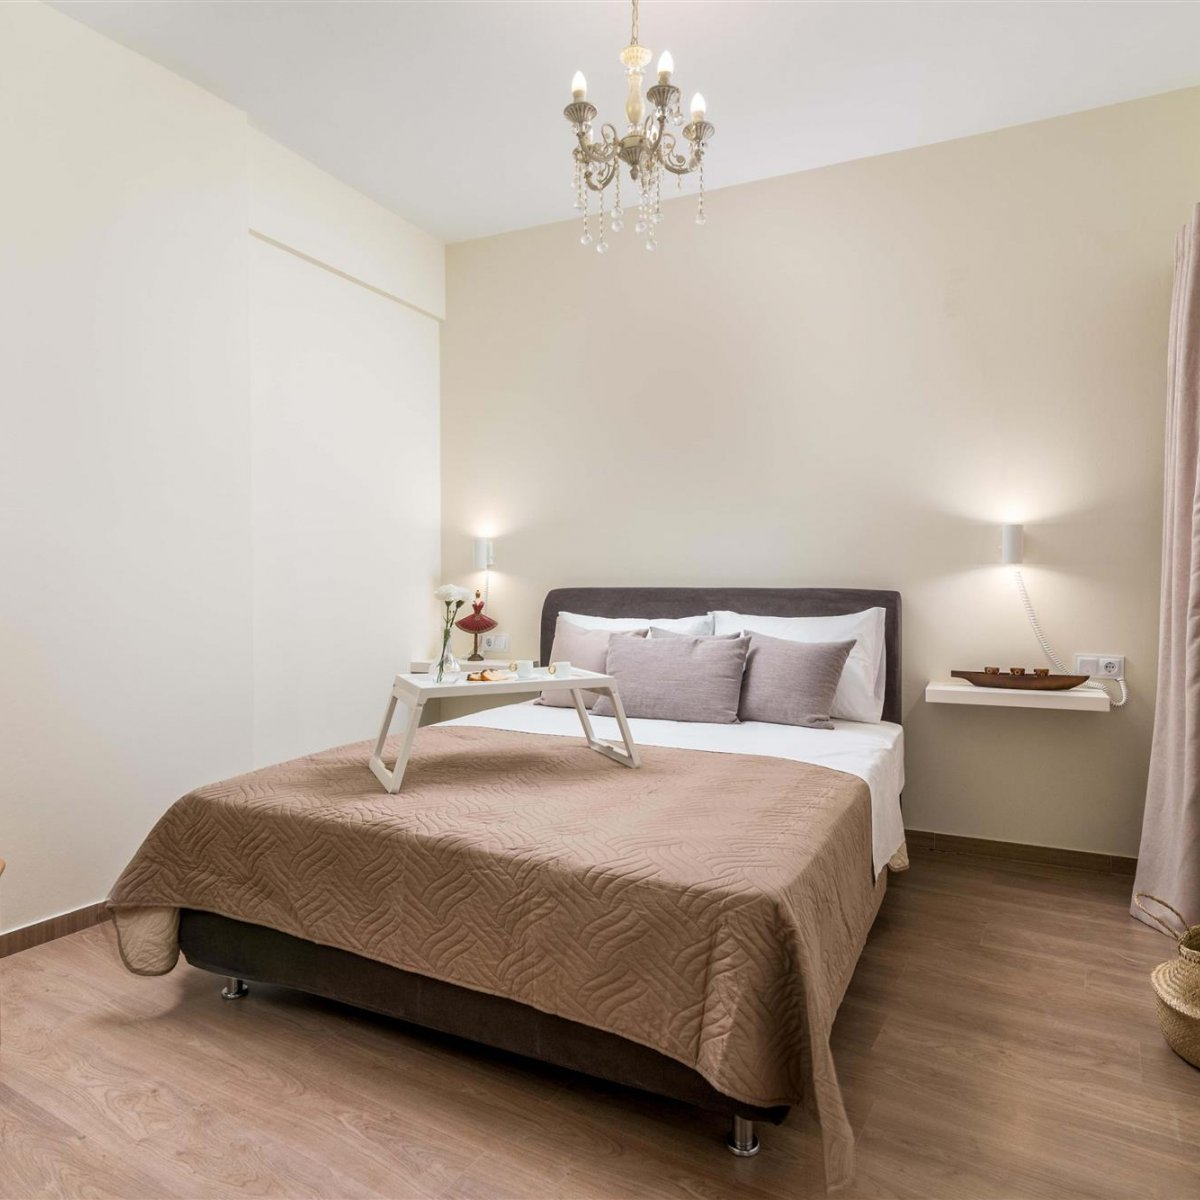 Mokamvilia Luxury Apartments - Διαμέρισμα Αλόη